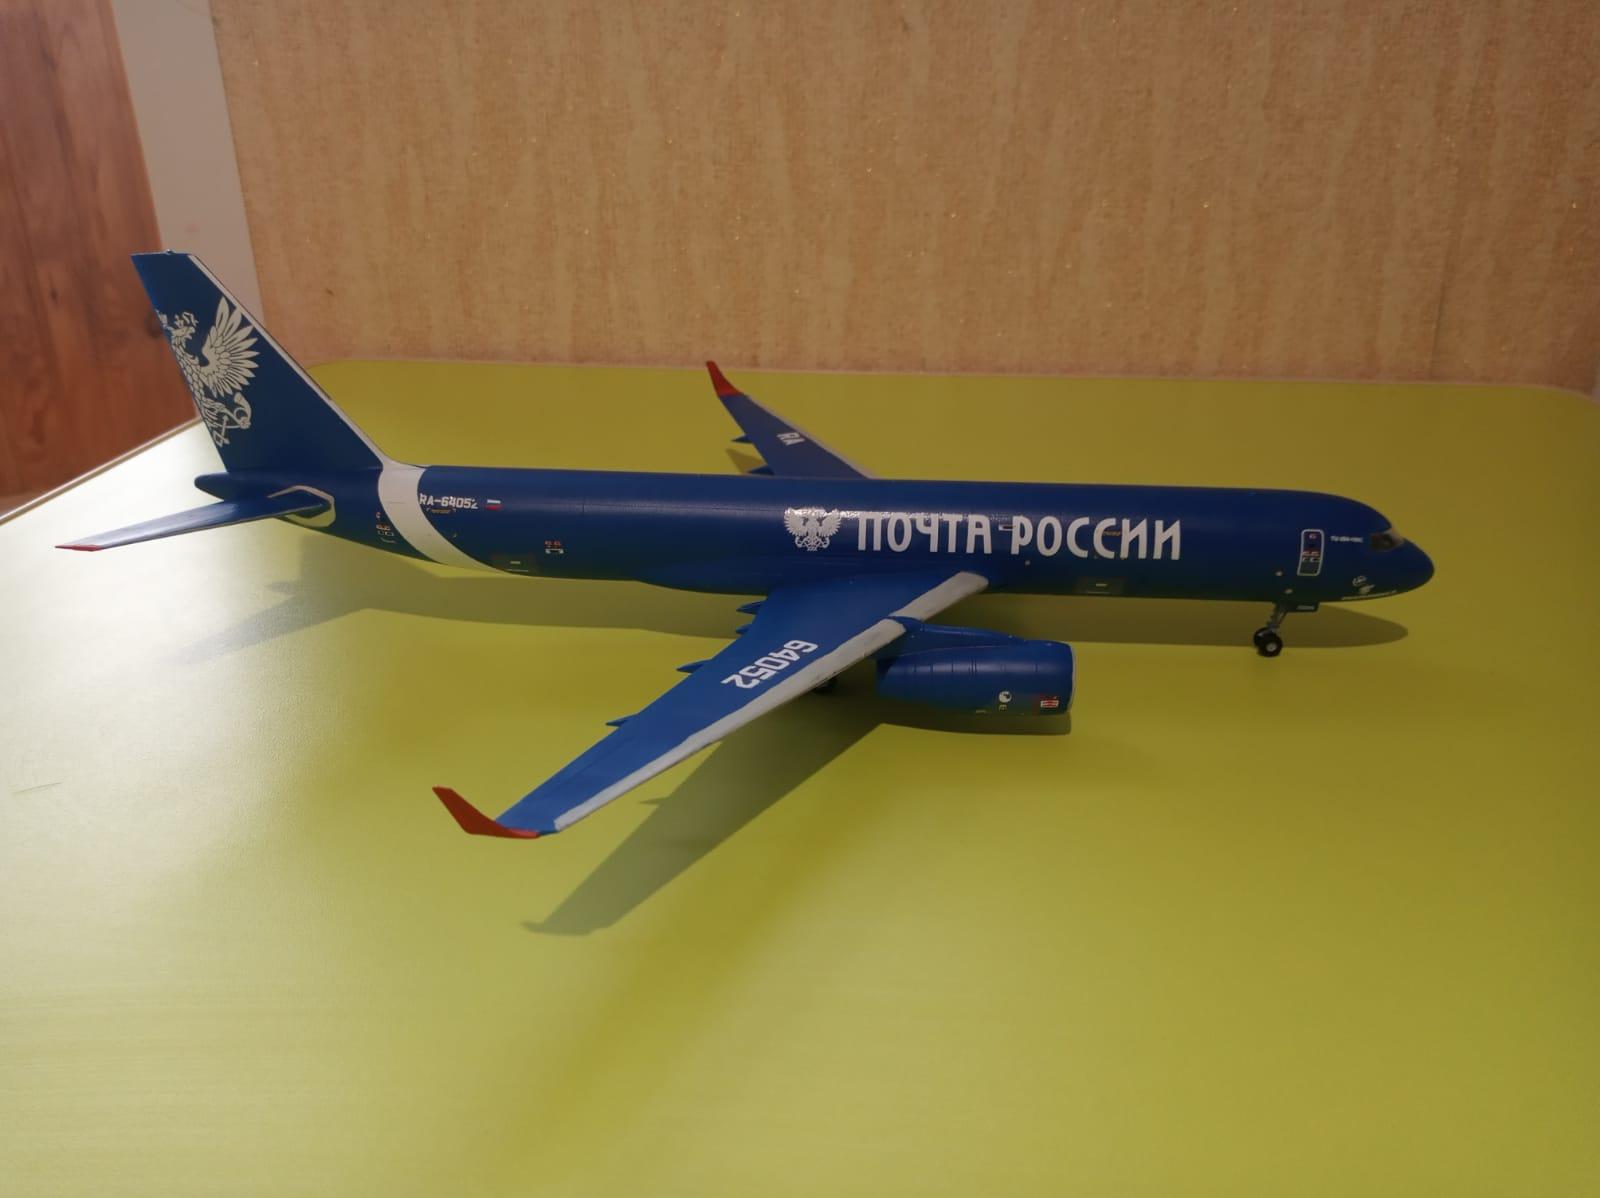 7022 Ту-204 Почта России Звезда, 1/144 Img-20210826-wa0003